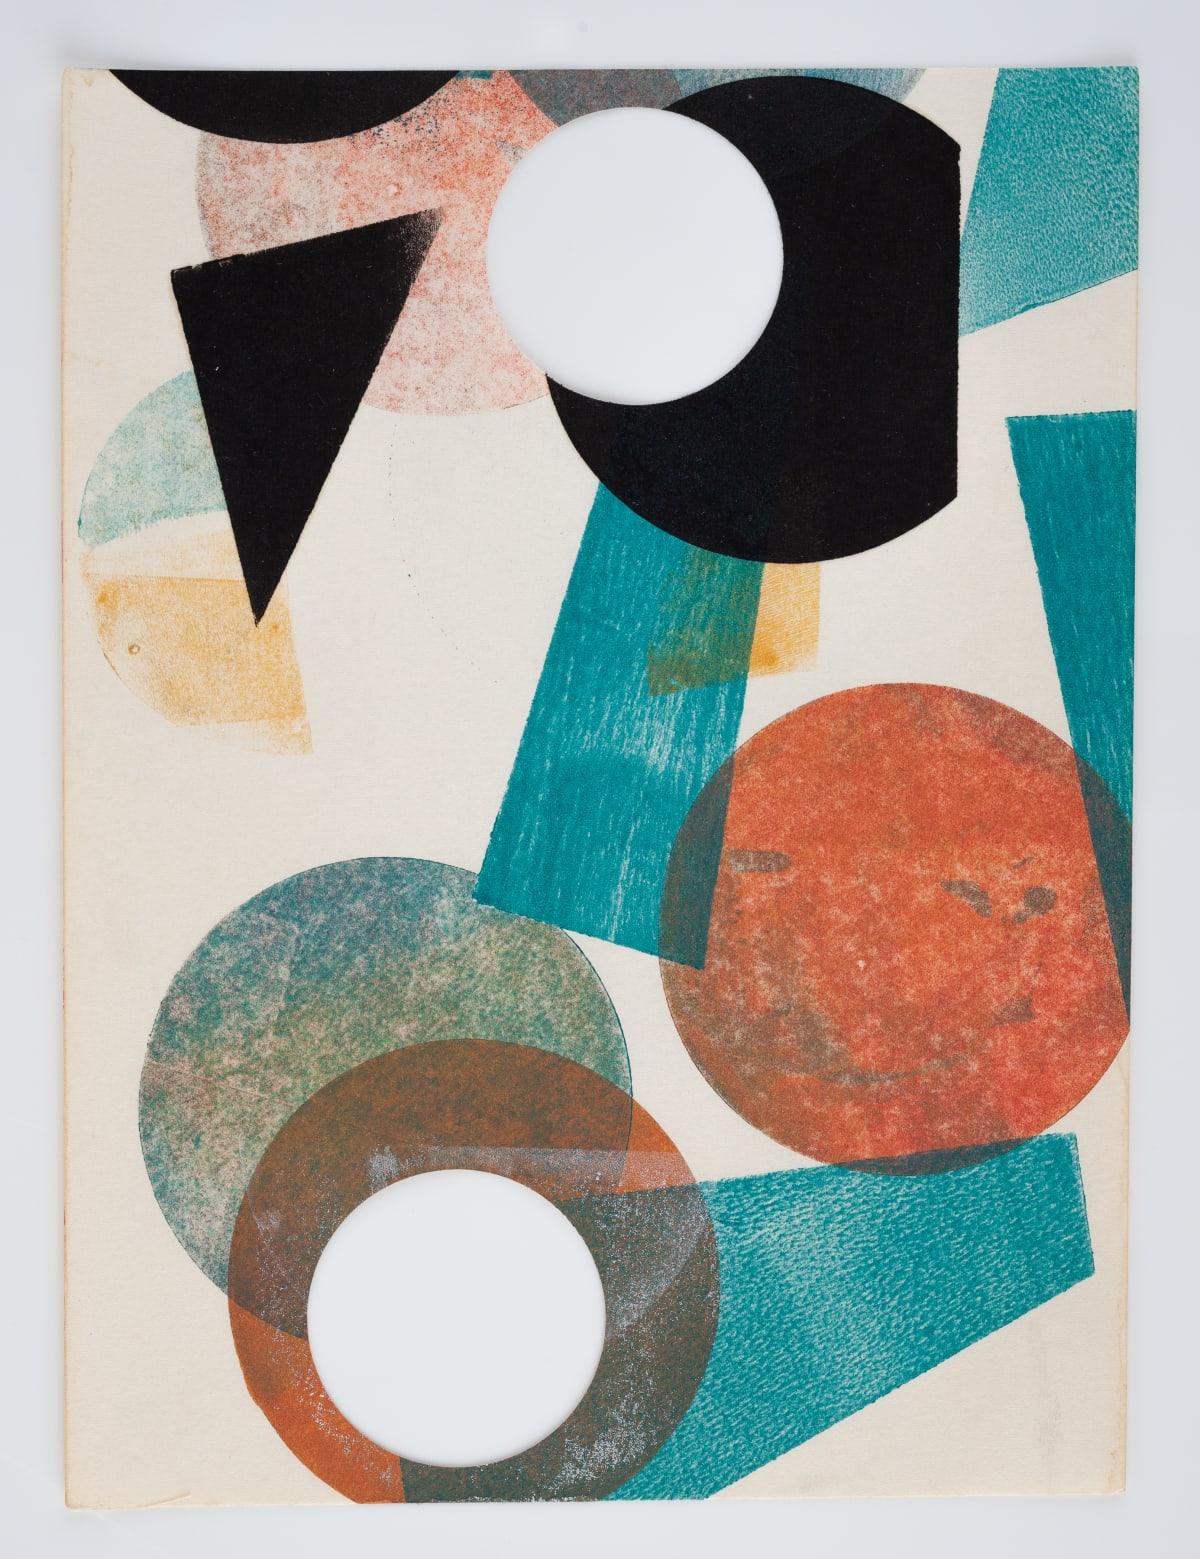 Austin Thomas, Circles of Oranges, Berries, Grapes, 2017